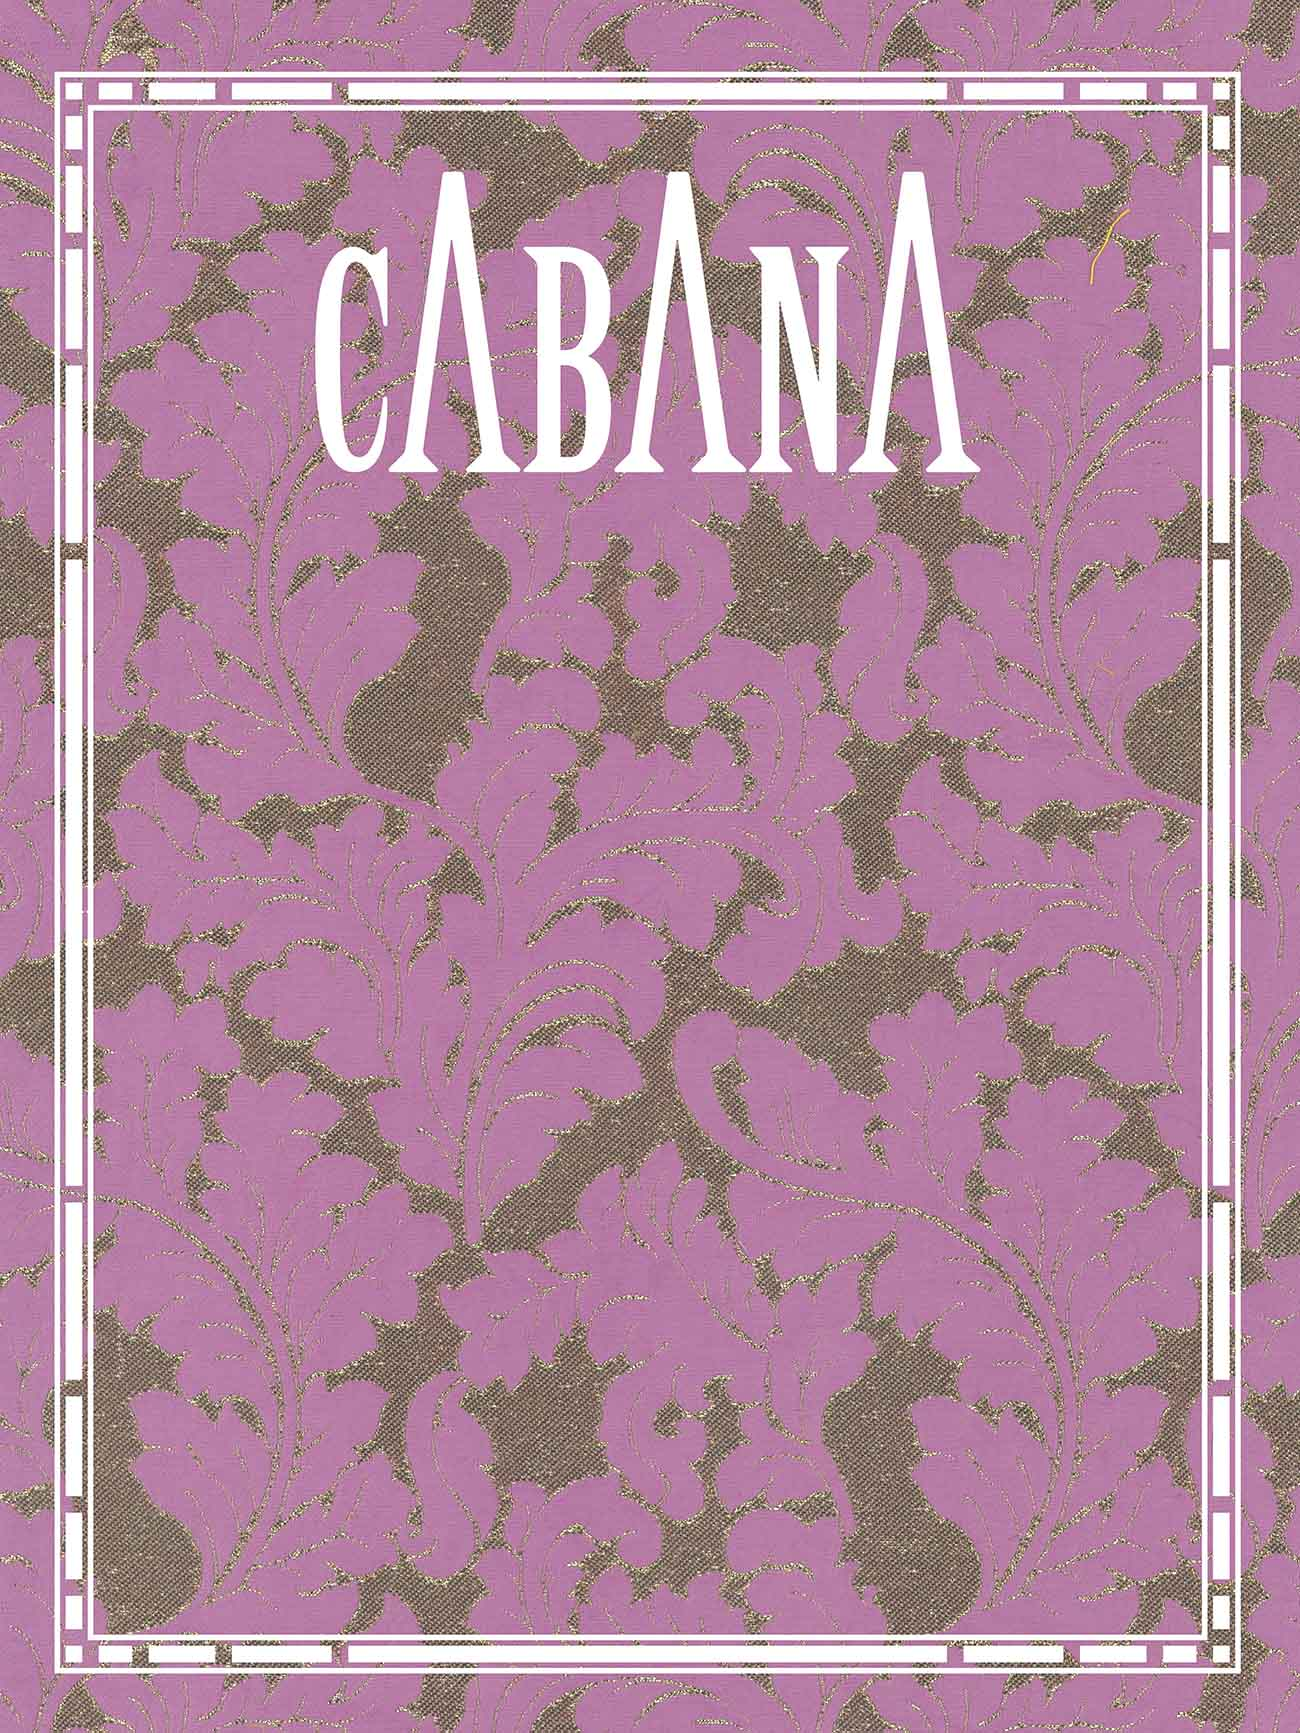 CABANA_Color_011.jpg